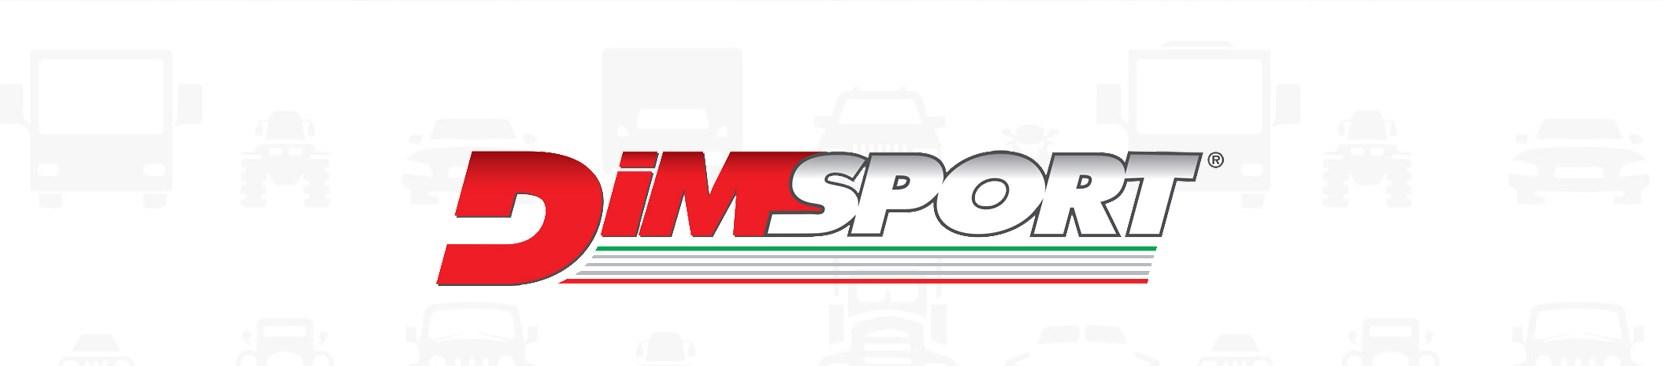 Dimsport Chip Tuning